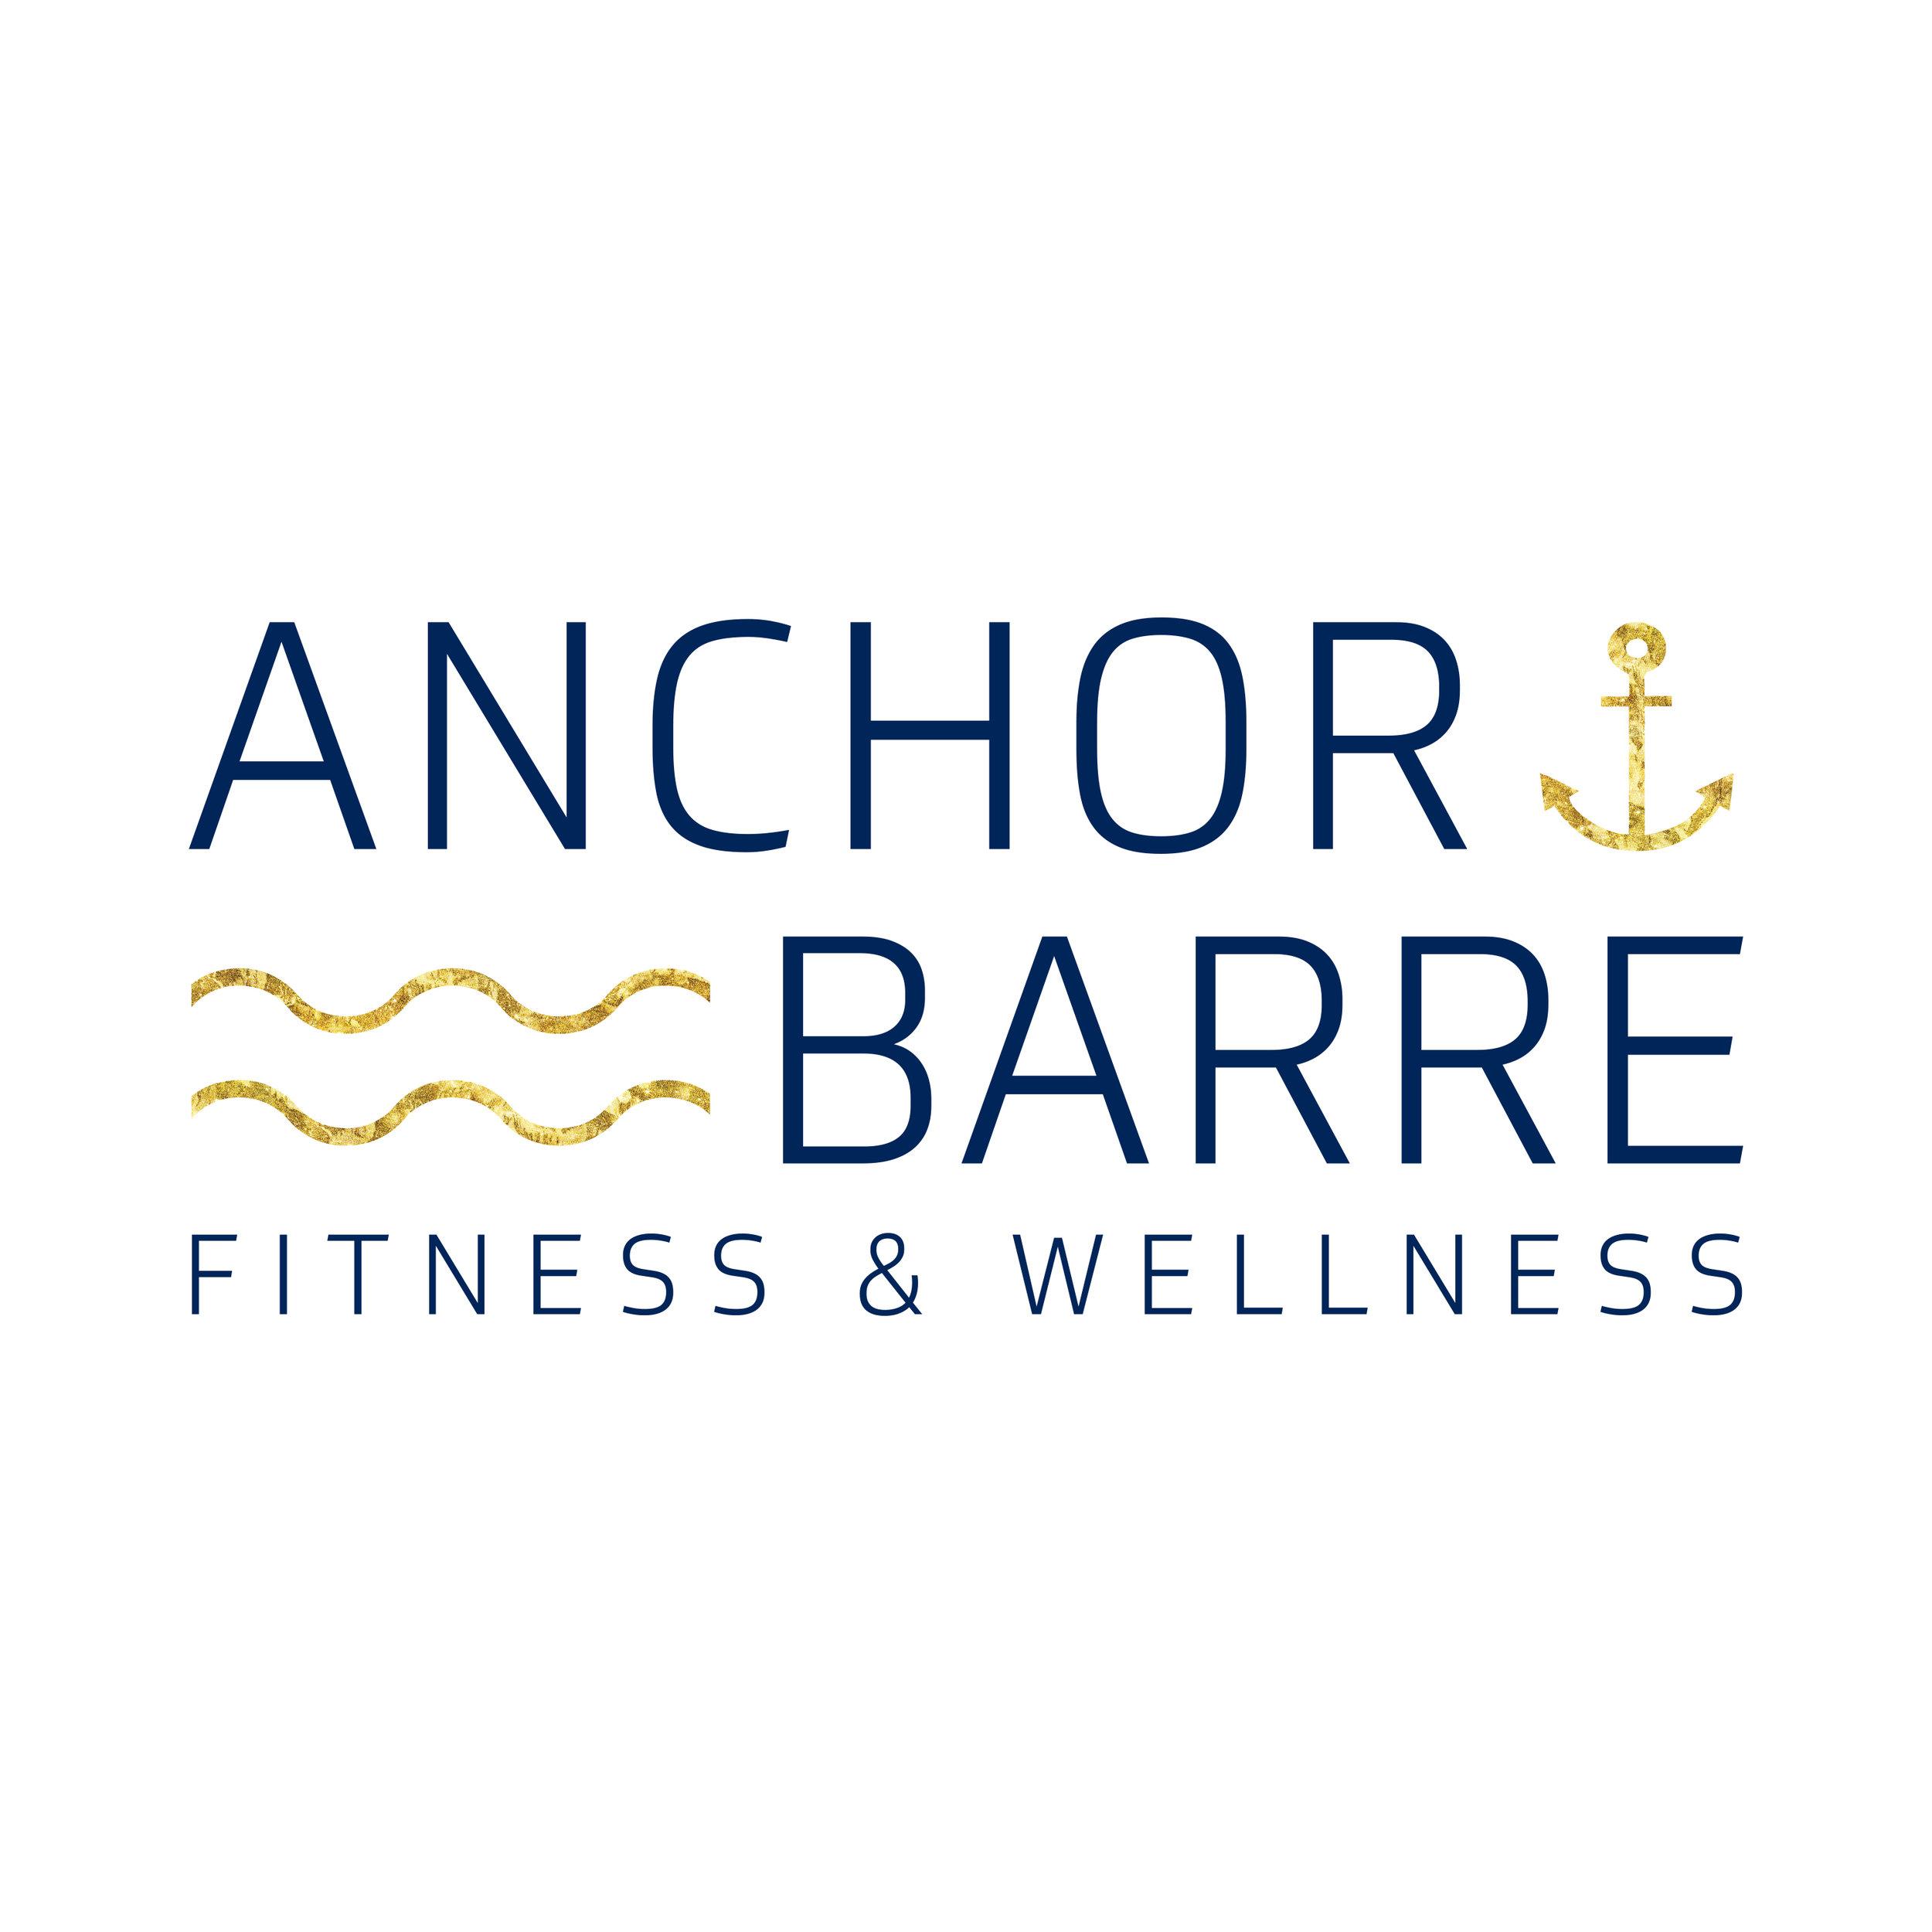 barre logo design graphic design